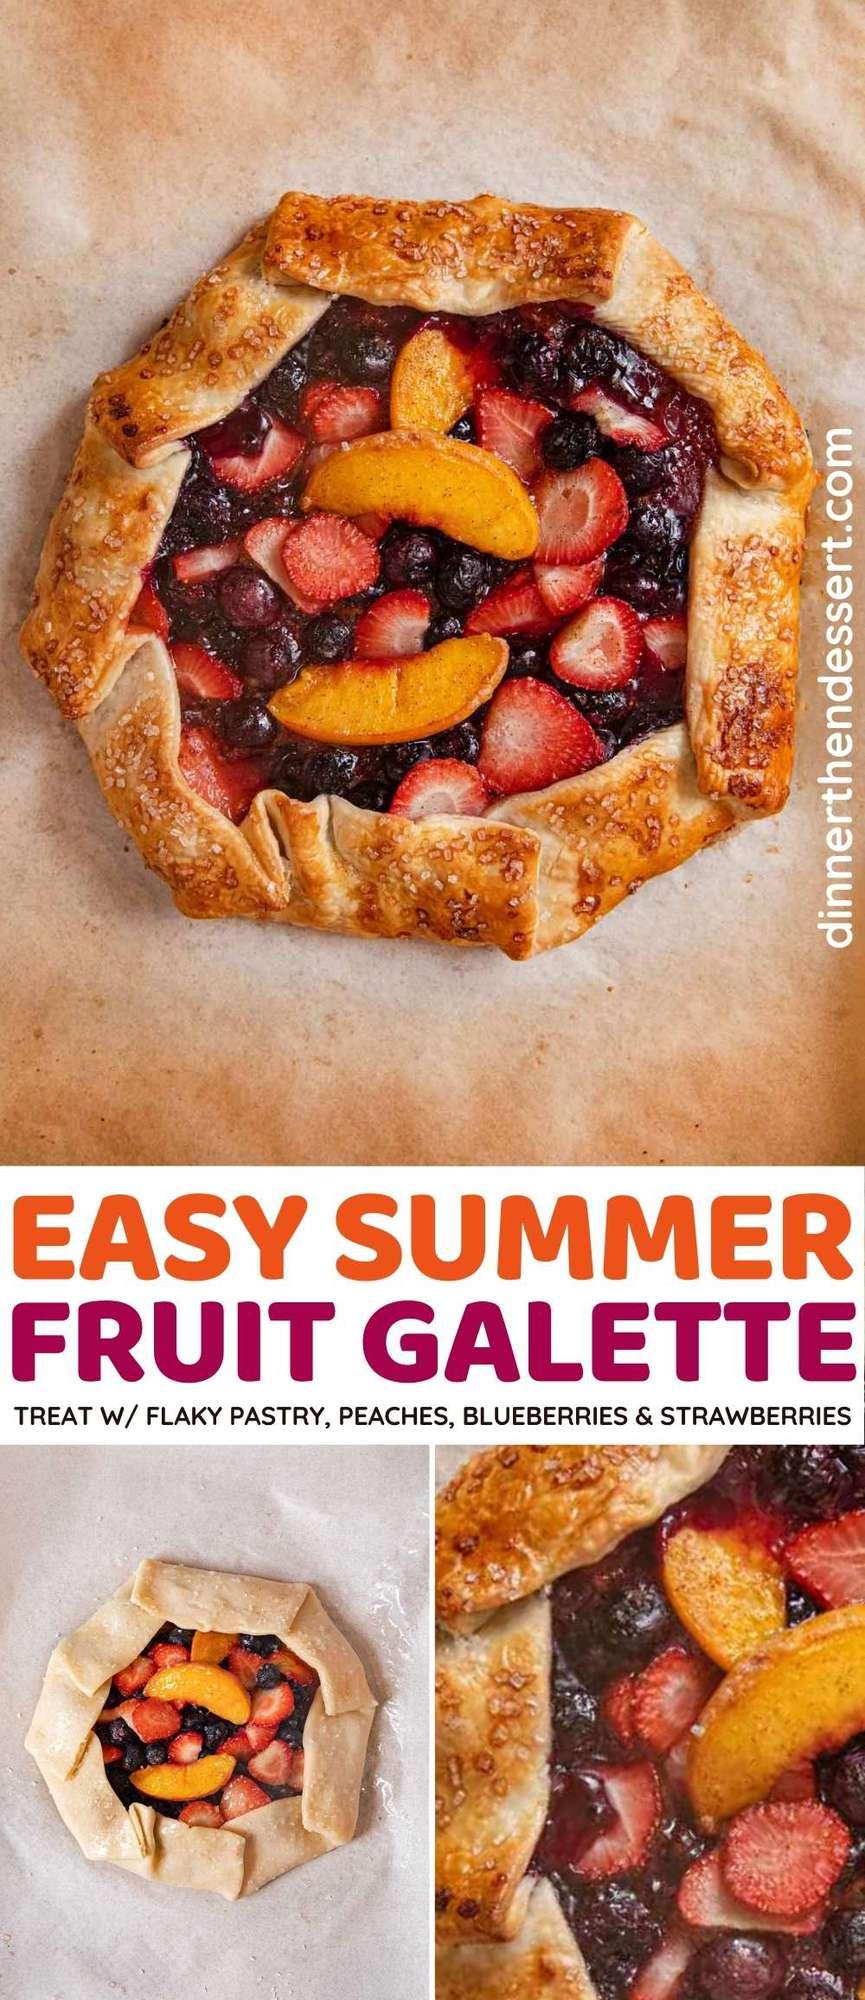 Summer Fruit Galette collage